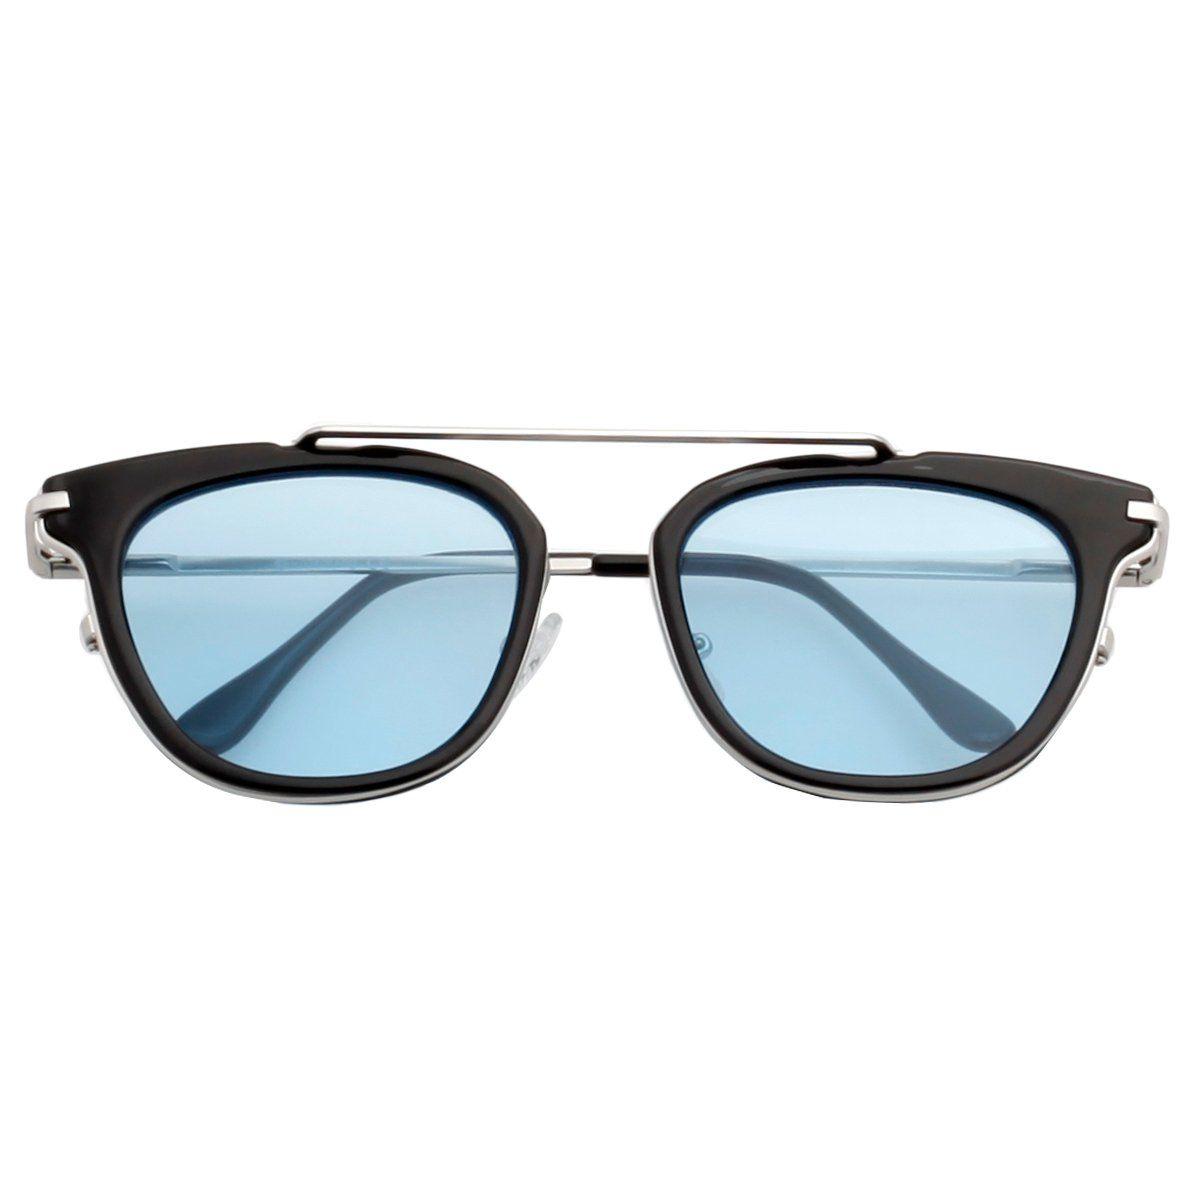 9f92c6849b VIVIENFANG Flat Tinted Lens Sunglasses Korean Fashion Square Shades For  Unisex 87066A Blue